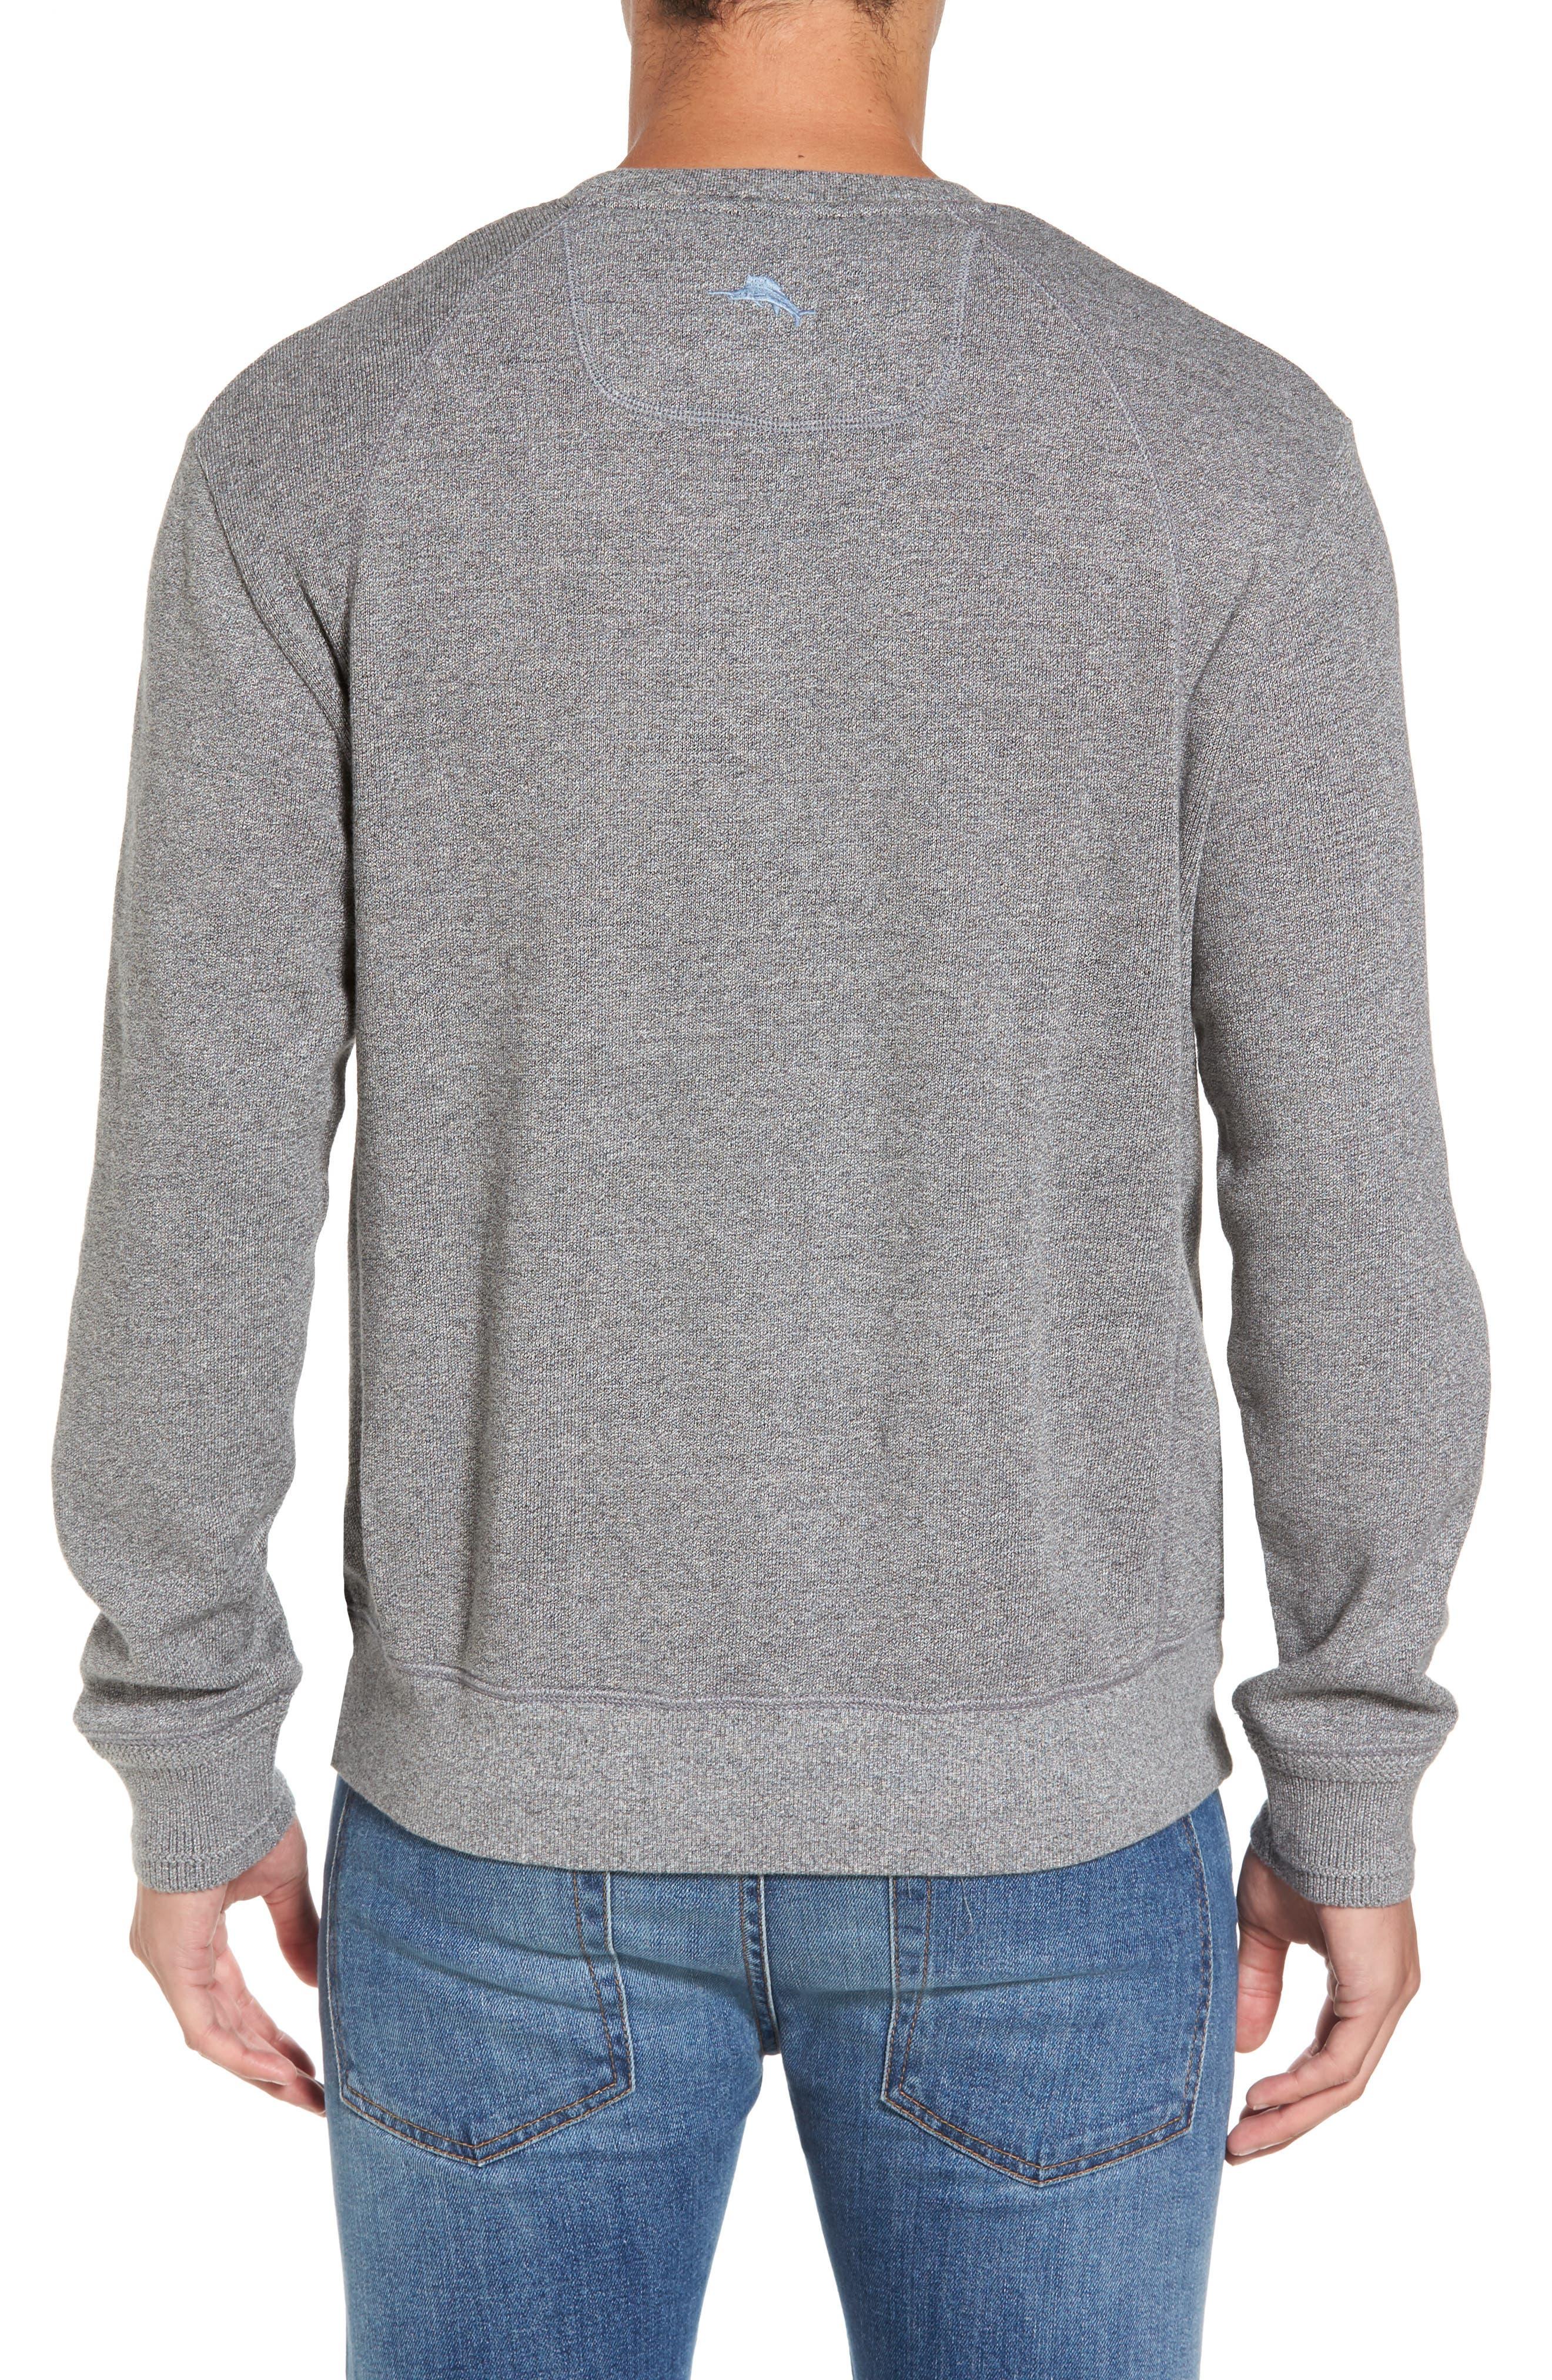 NFL Stitch of Liberty Embroidered Crewneck Sweatshirt,                             Alternate thumbnail 53, color,